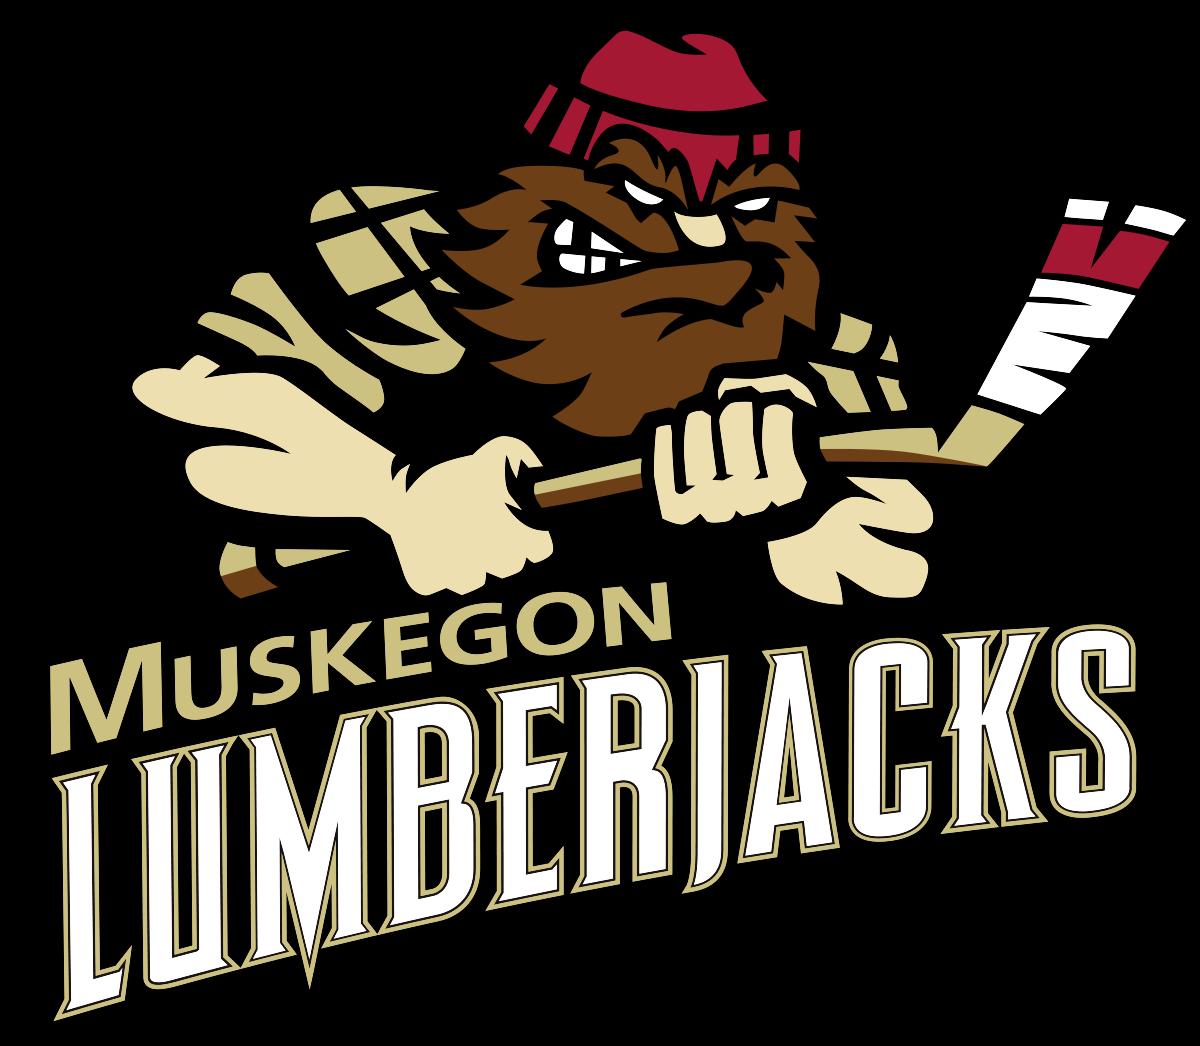 graphic royalty free stock Lumberjack clipart svg. Muskegon lumberjacks wikipedia .